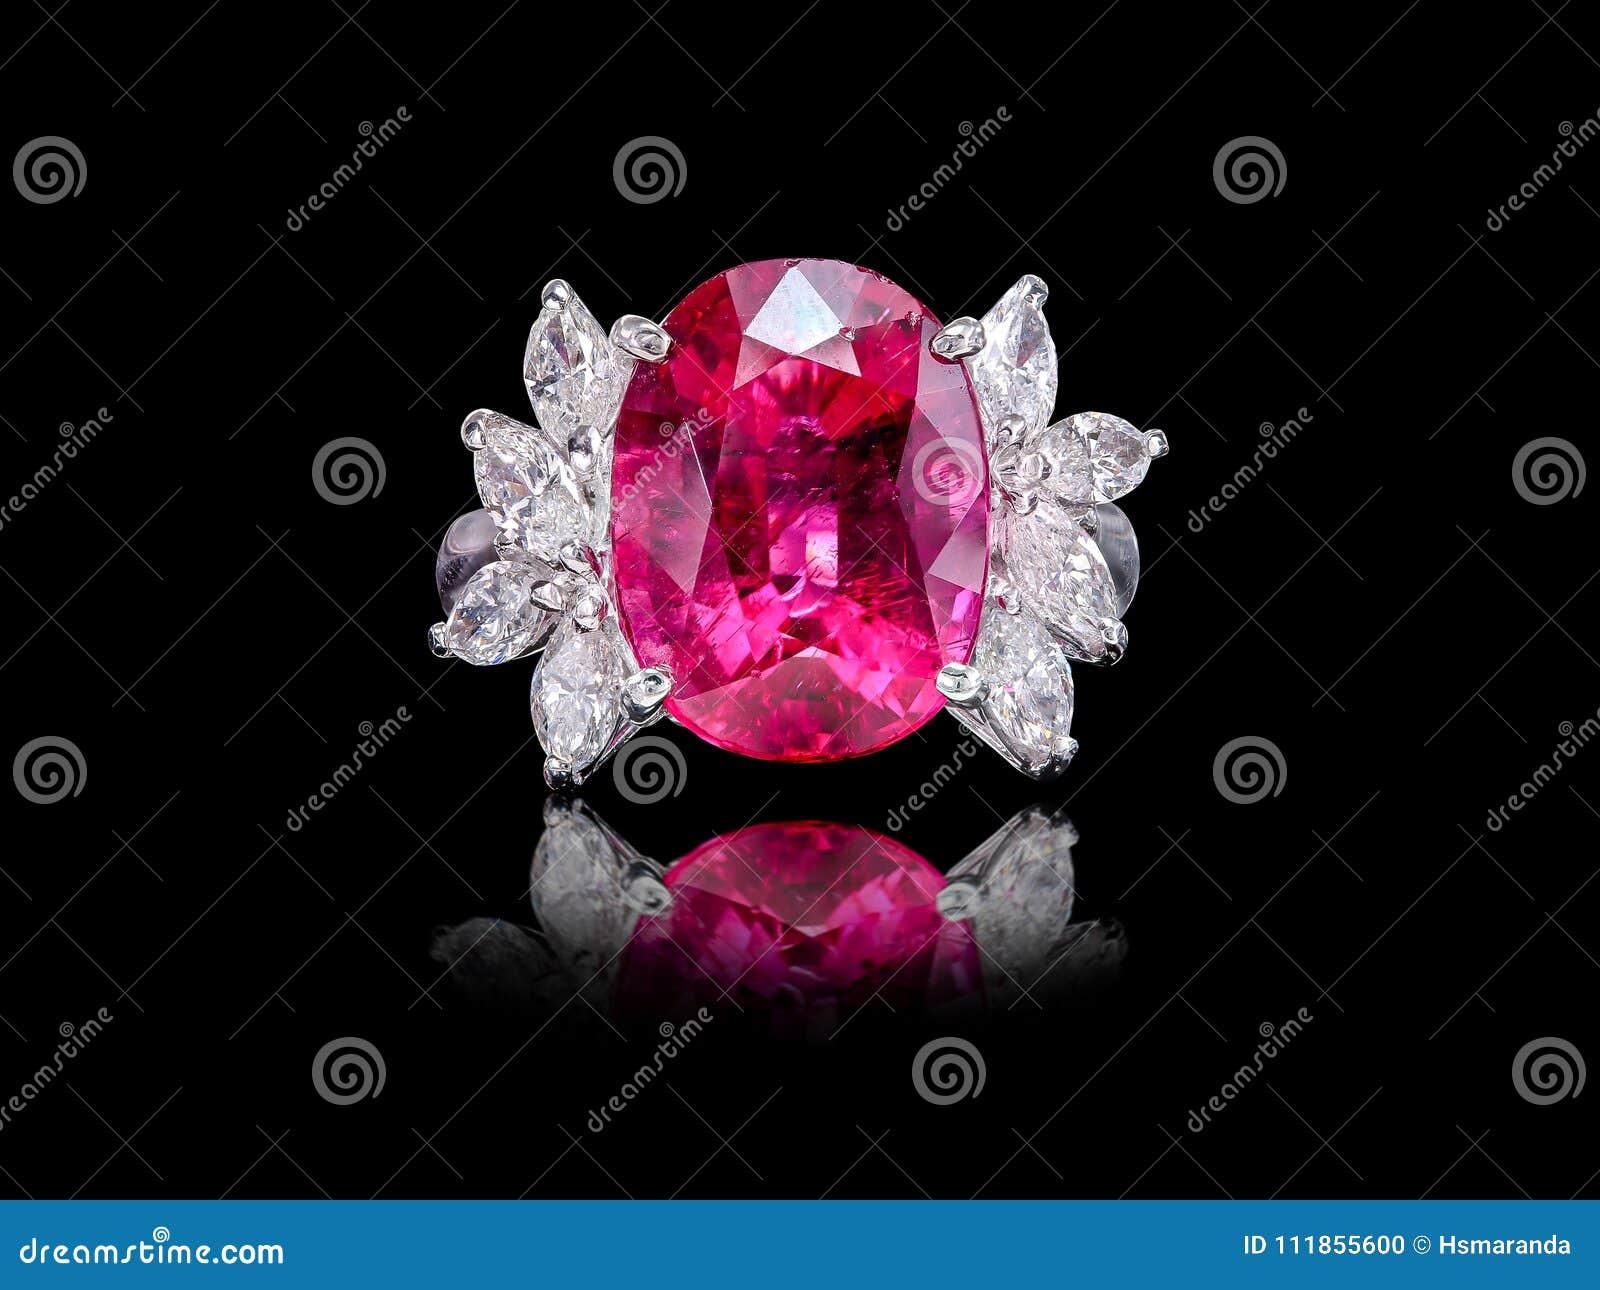 Diamonds Pink black background pictures best photo